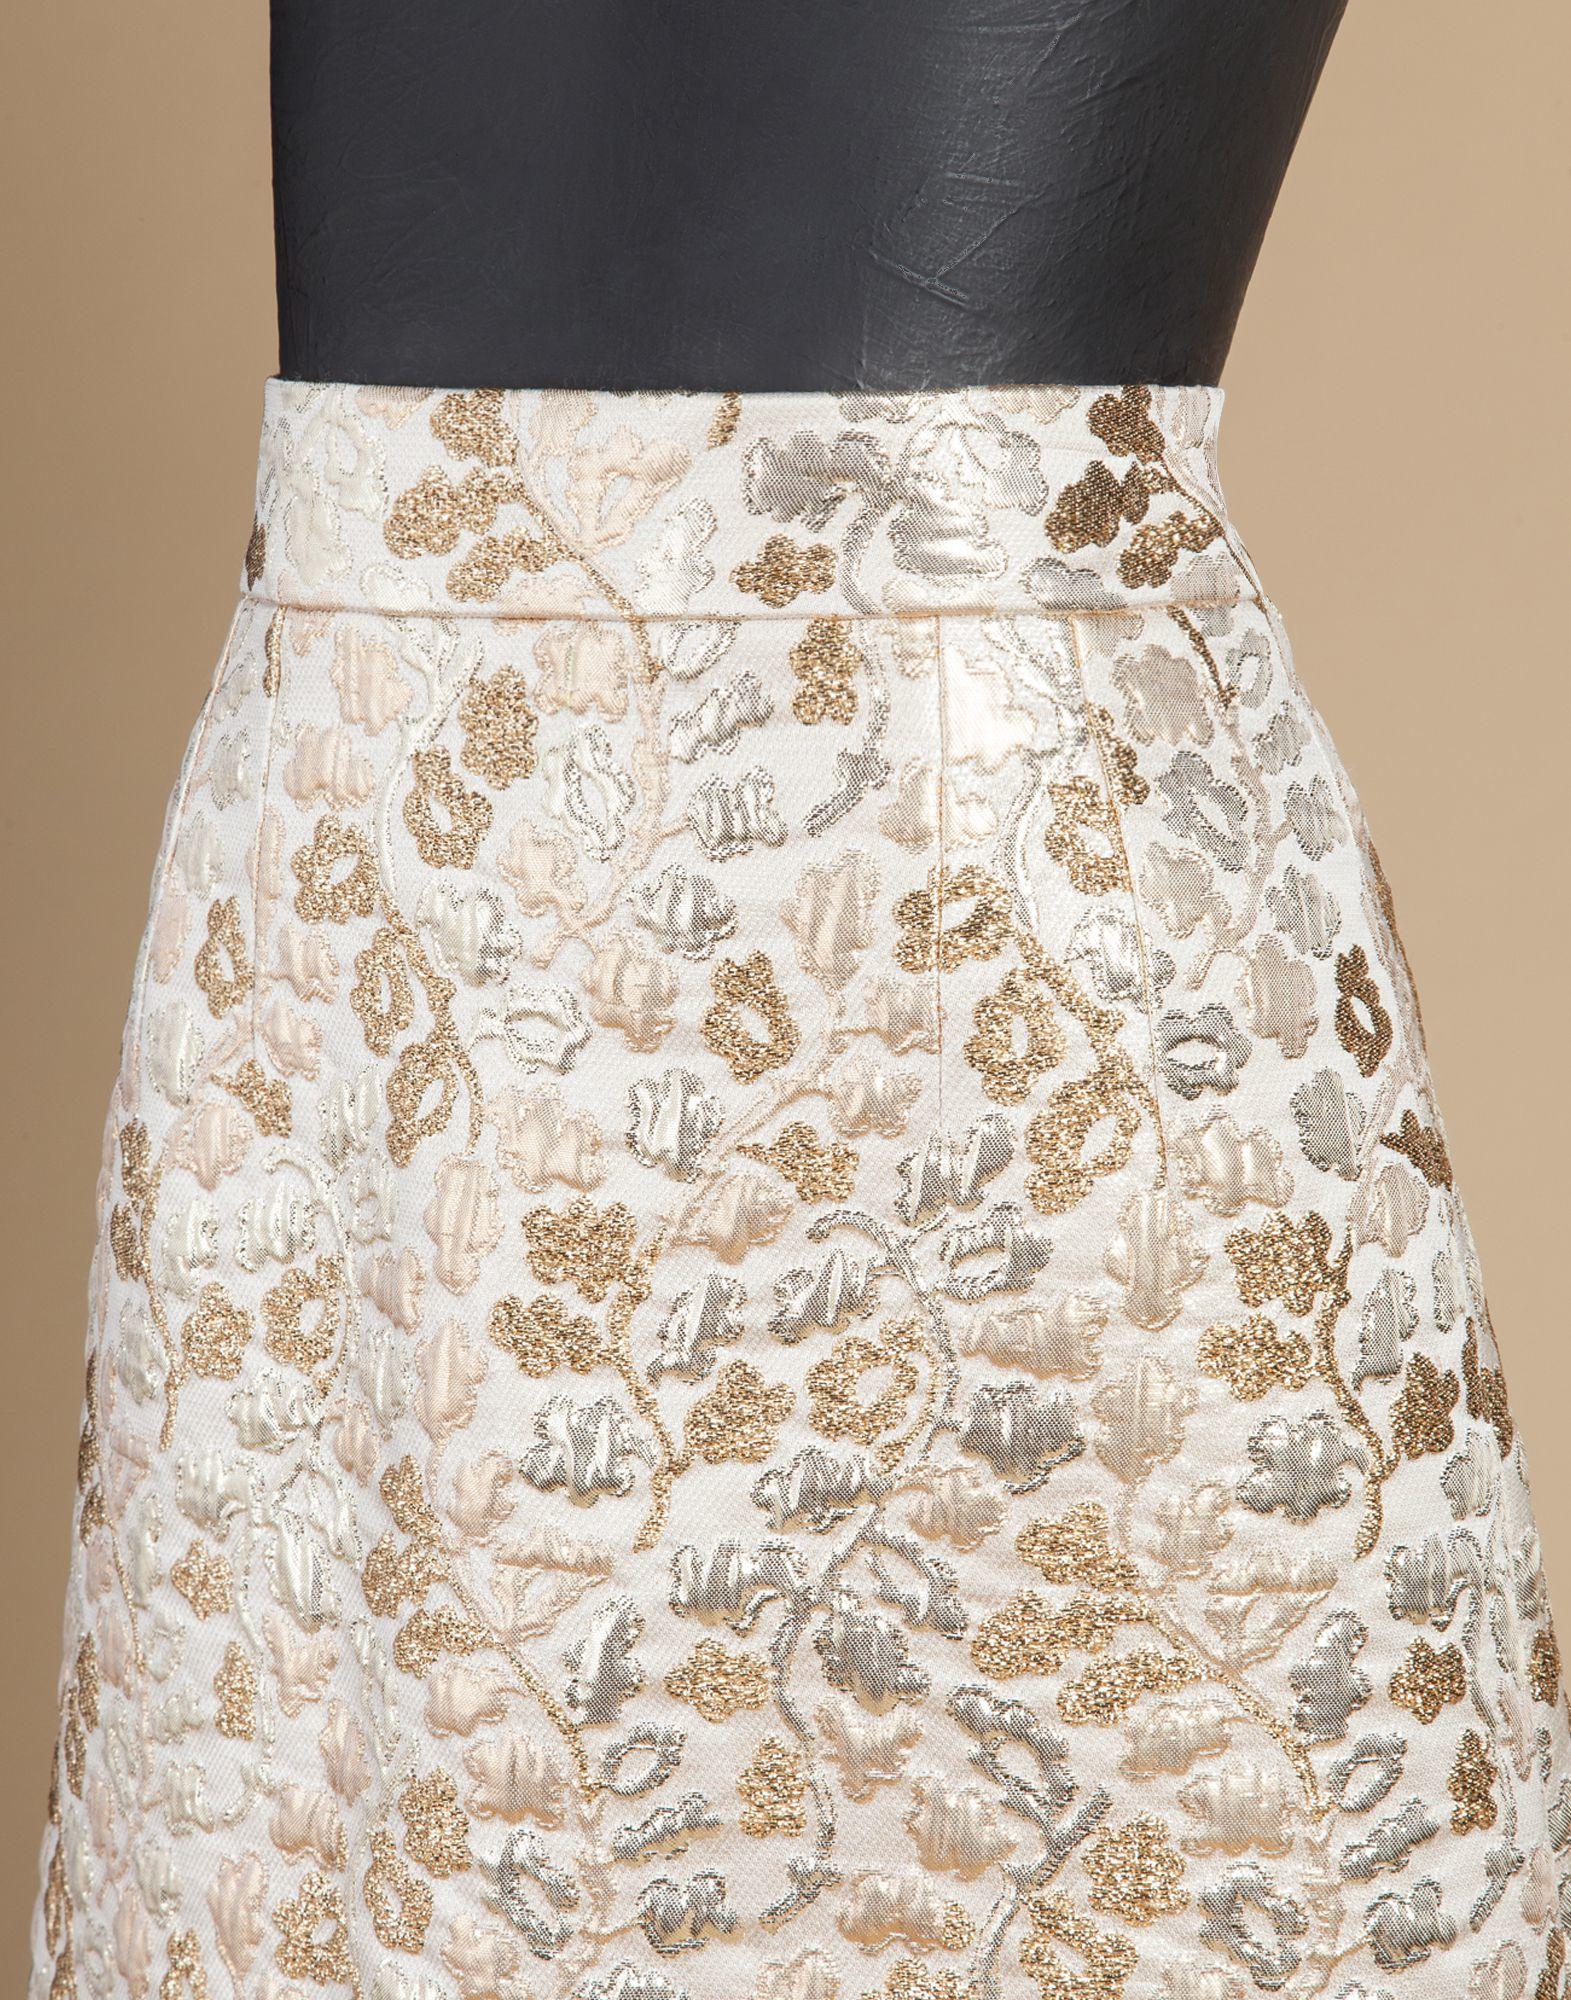 Lyst - Dolce   Gabbana A-line Skirt In Lurex Brocade in Metallic c2905e5a88